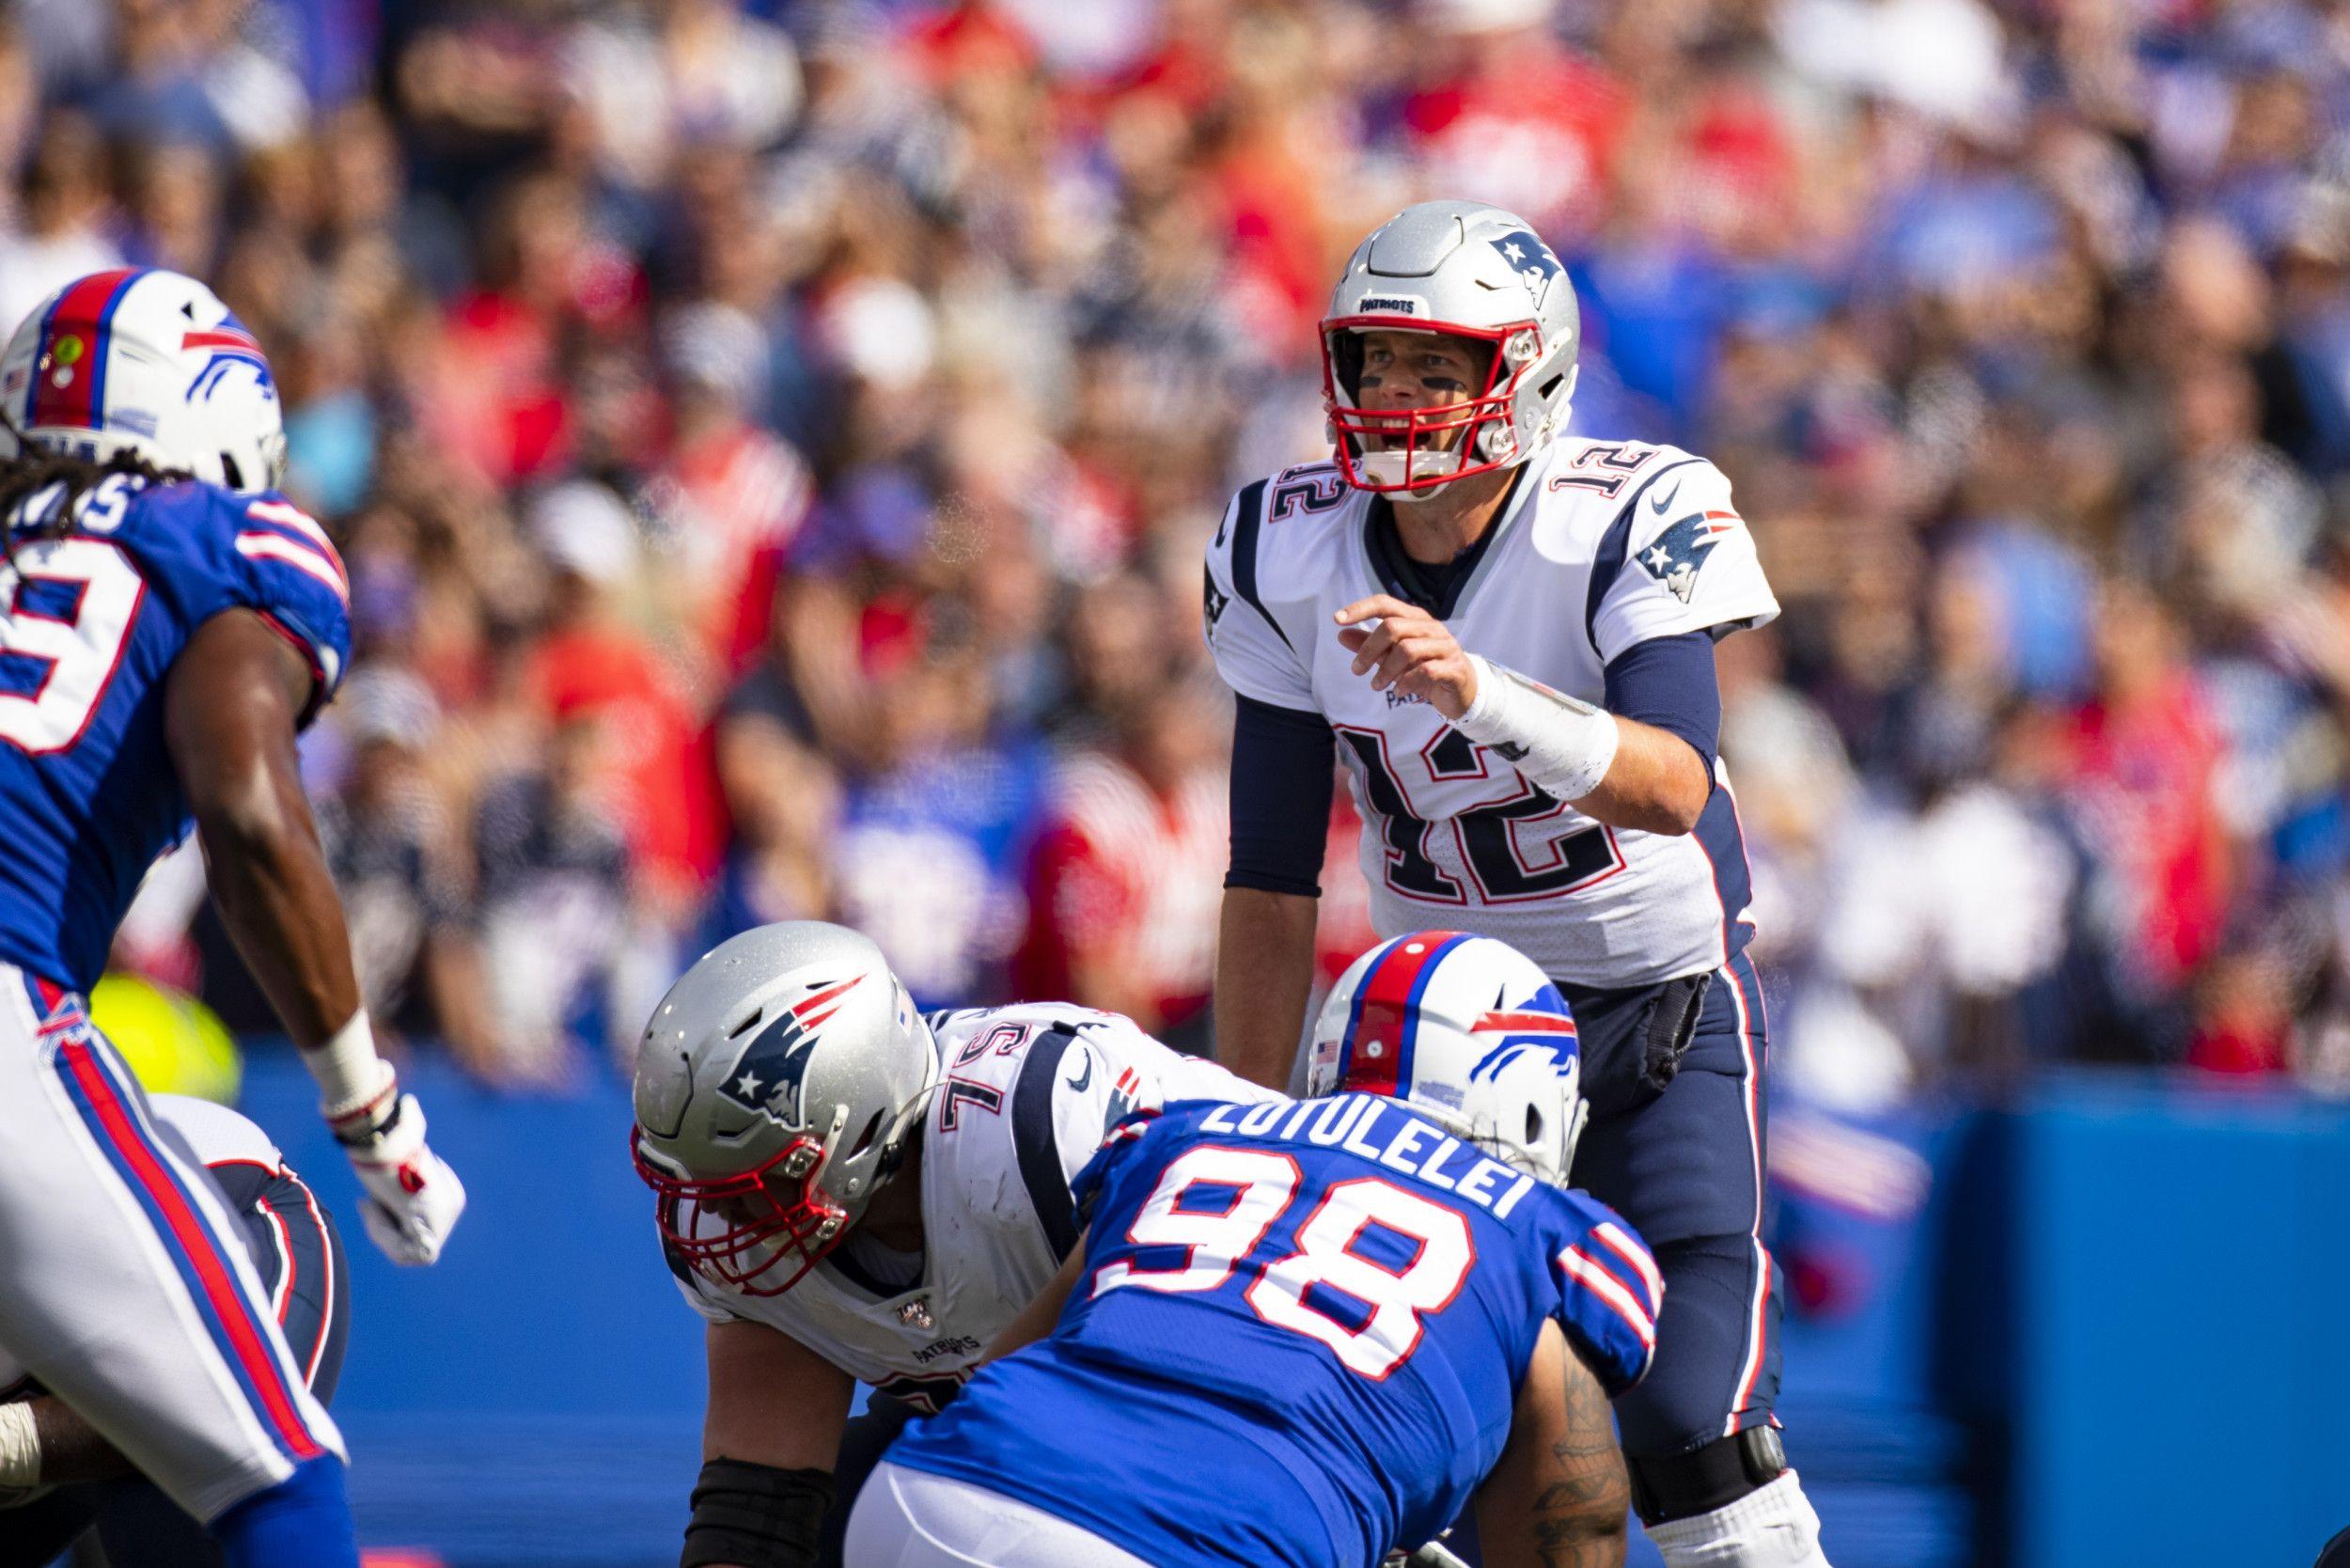 Buffalo Bills vs. New England Patriots How to Watch, Live